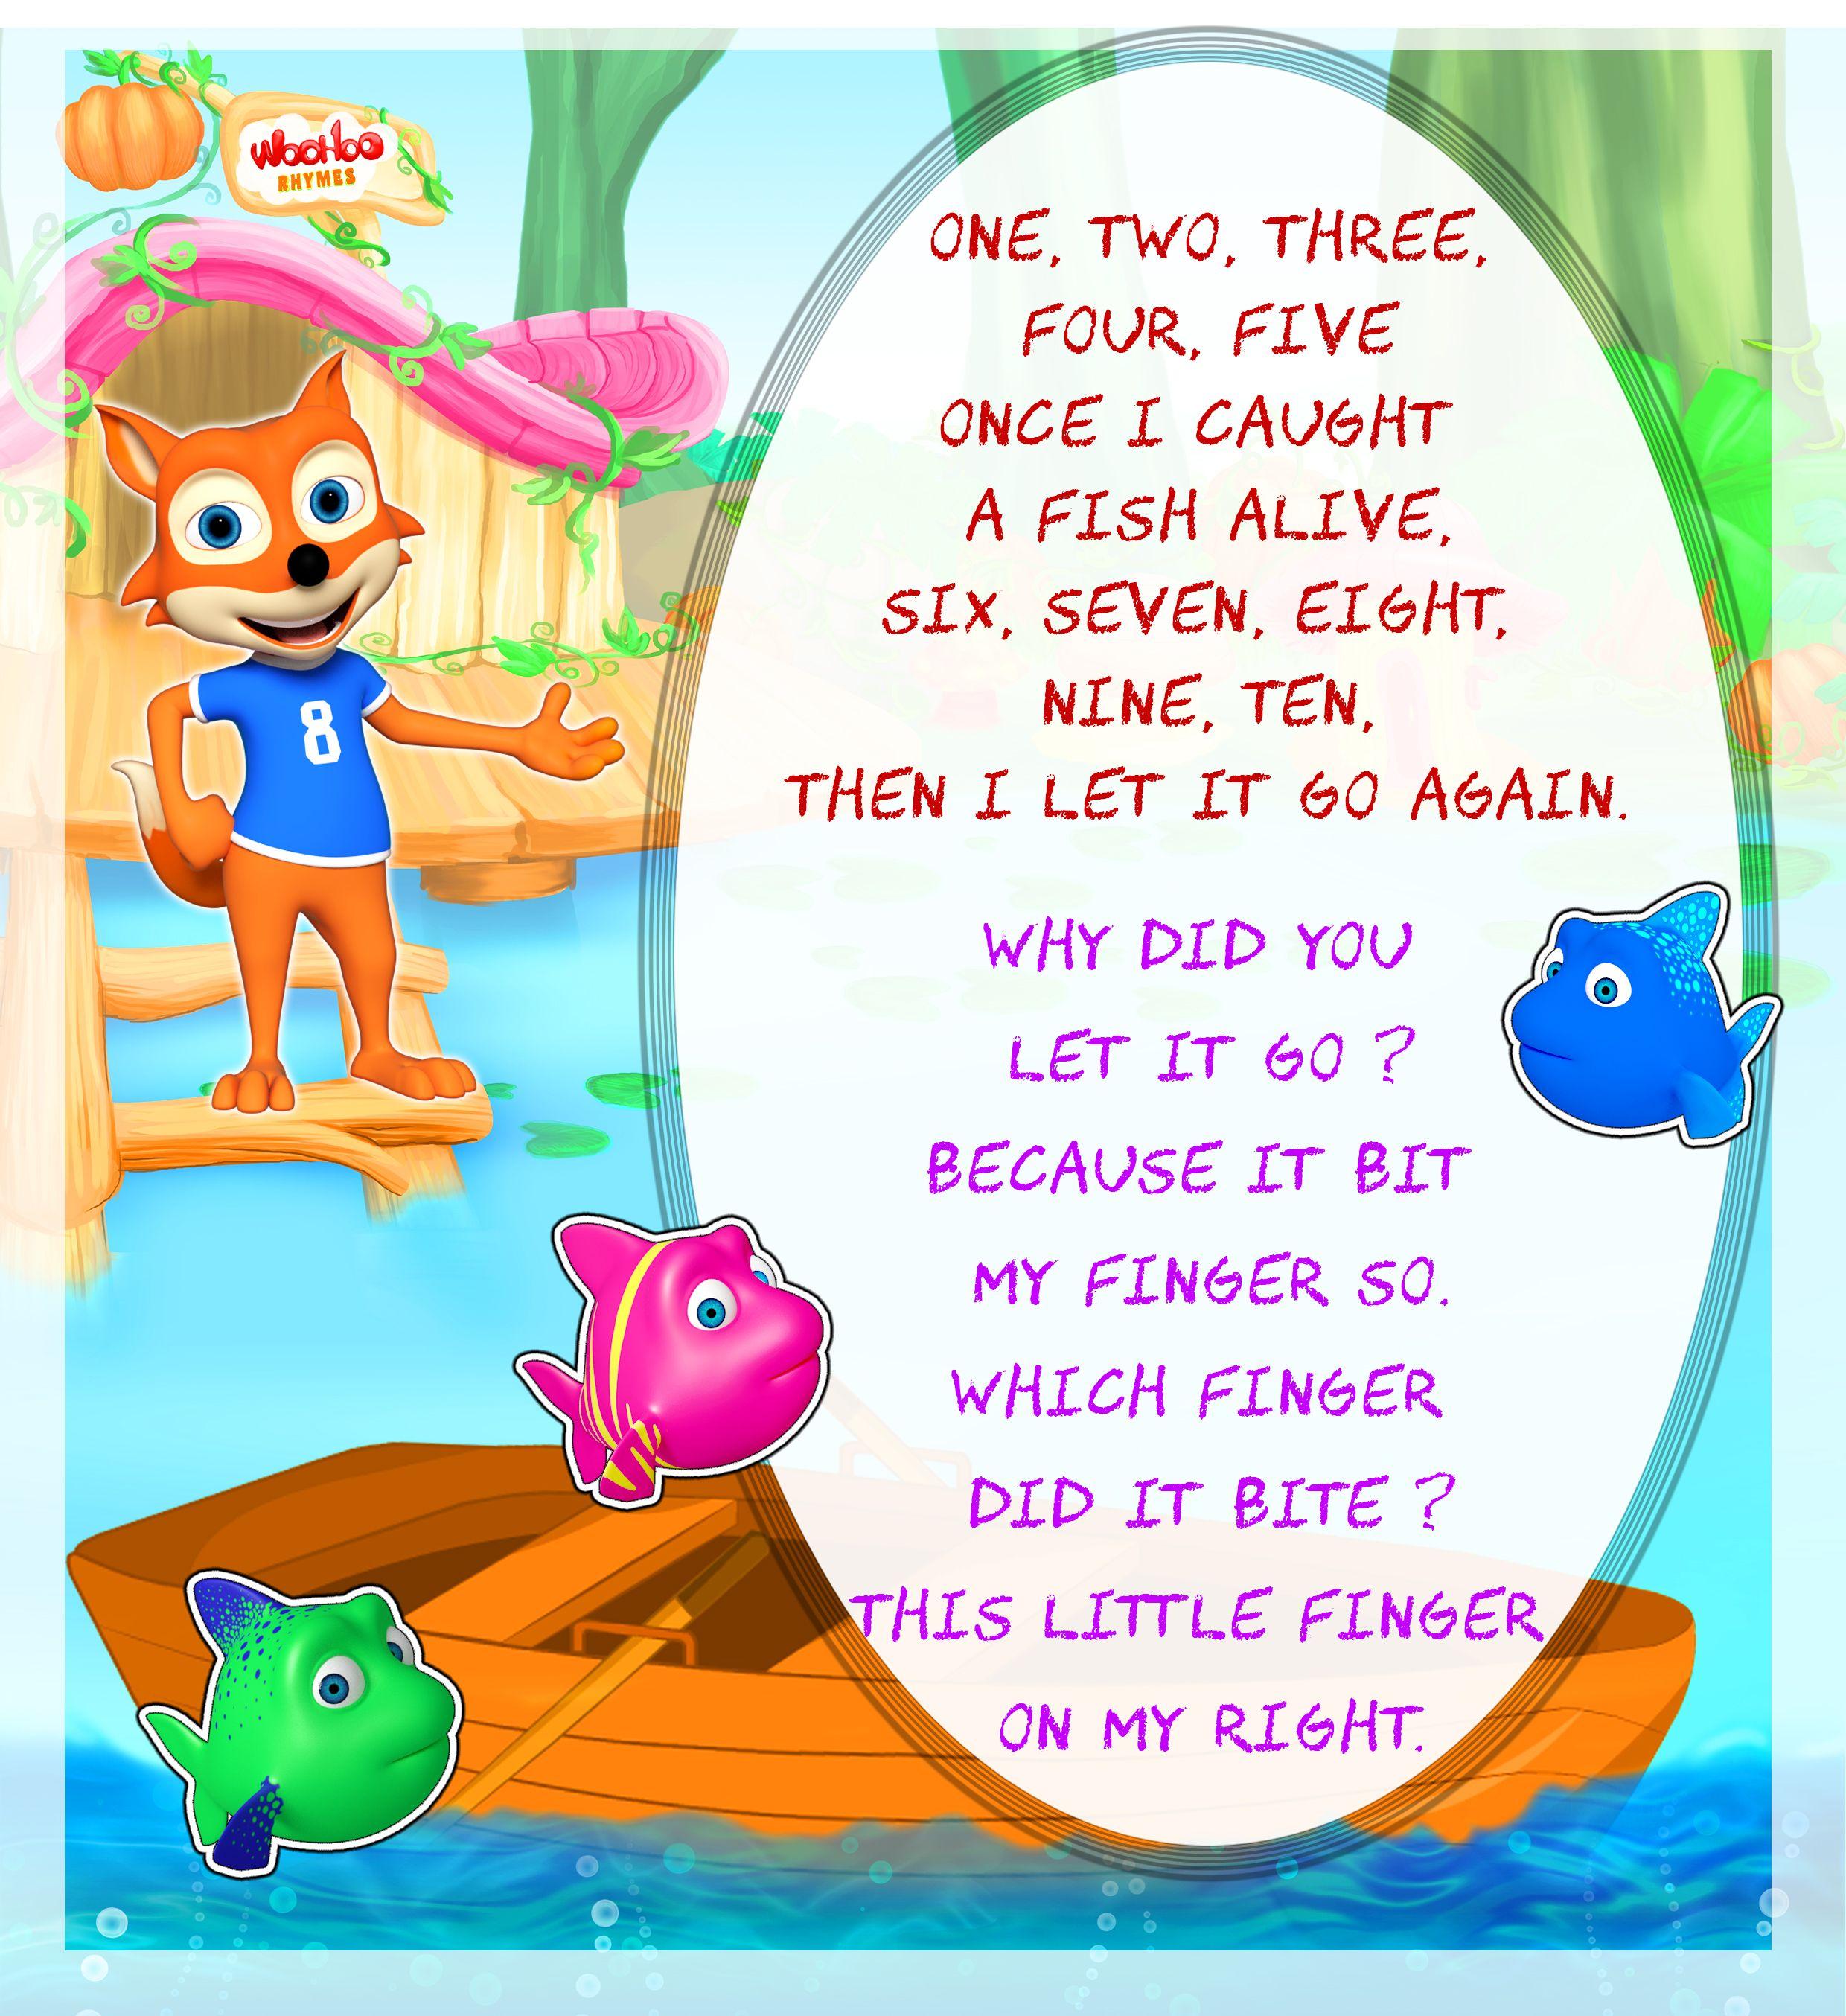 Once I caught a Fish Alive WooHooRhymes nurseryrhymes